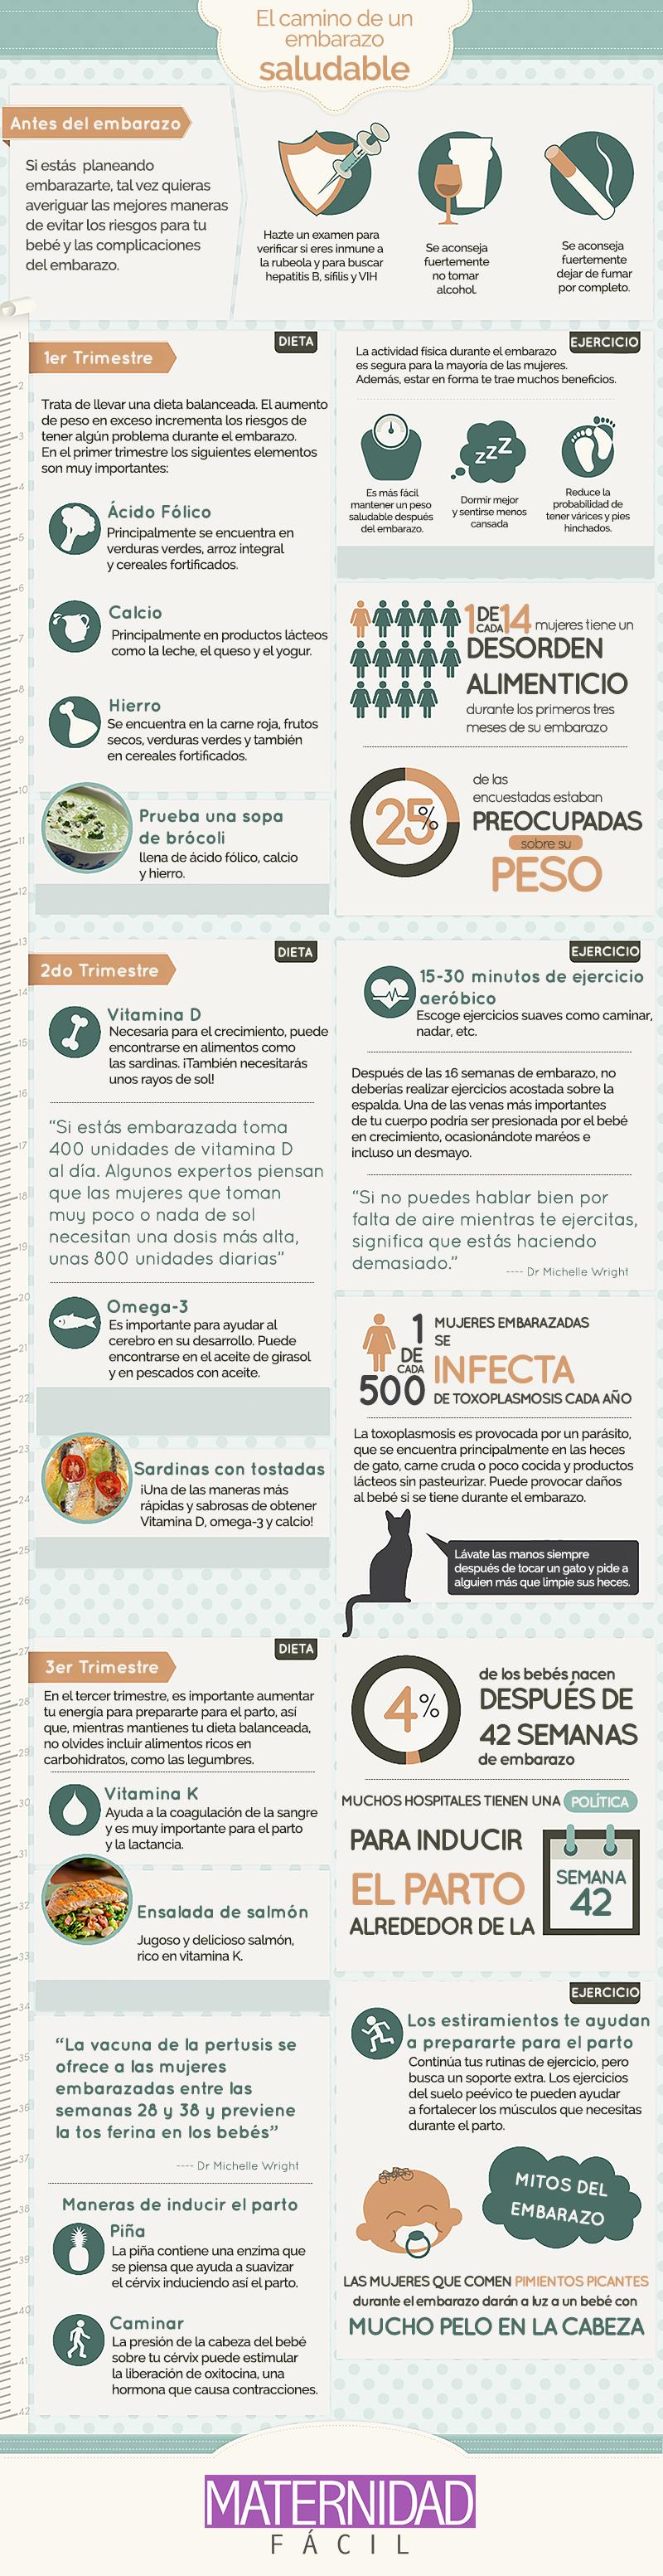 infografia embarazo saludable